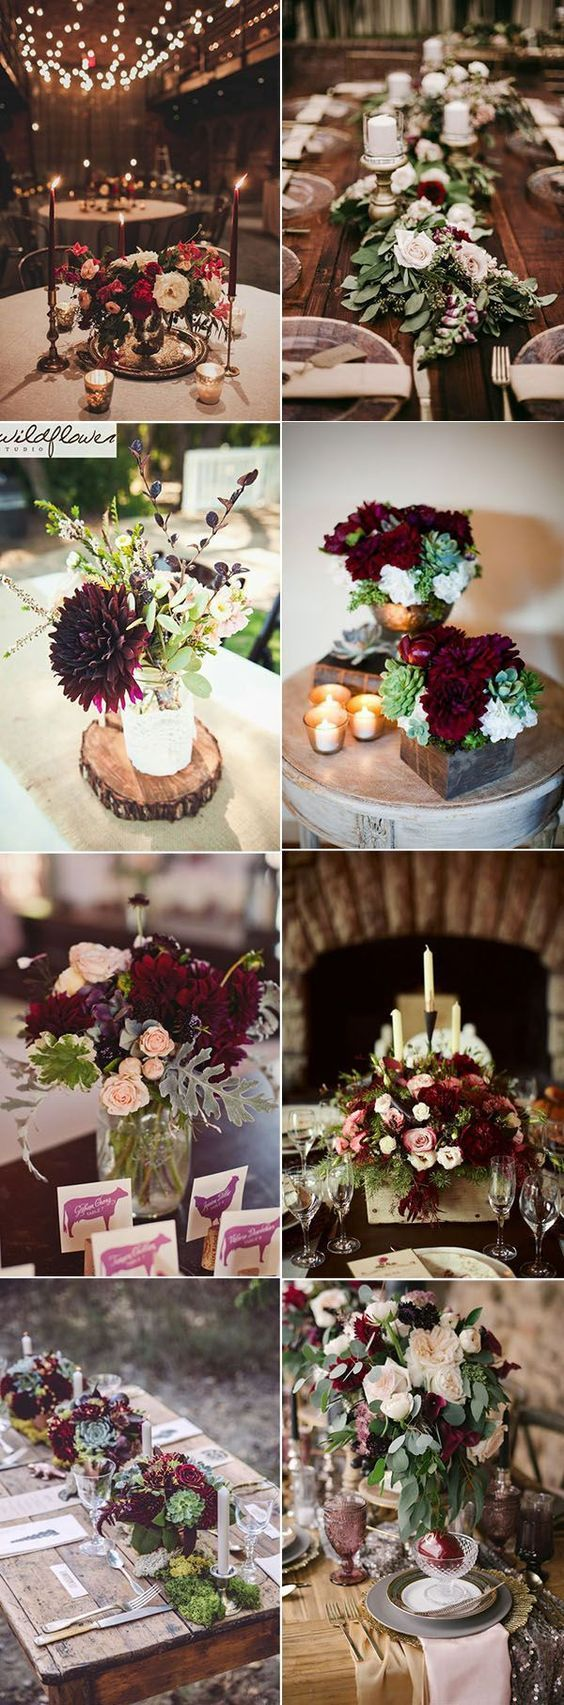 Wedding decor ideas 2018  beautiful burgundy wedding centerpieces ideas for any wedding themes